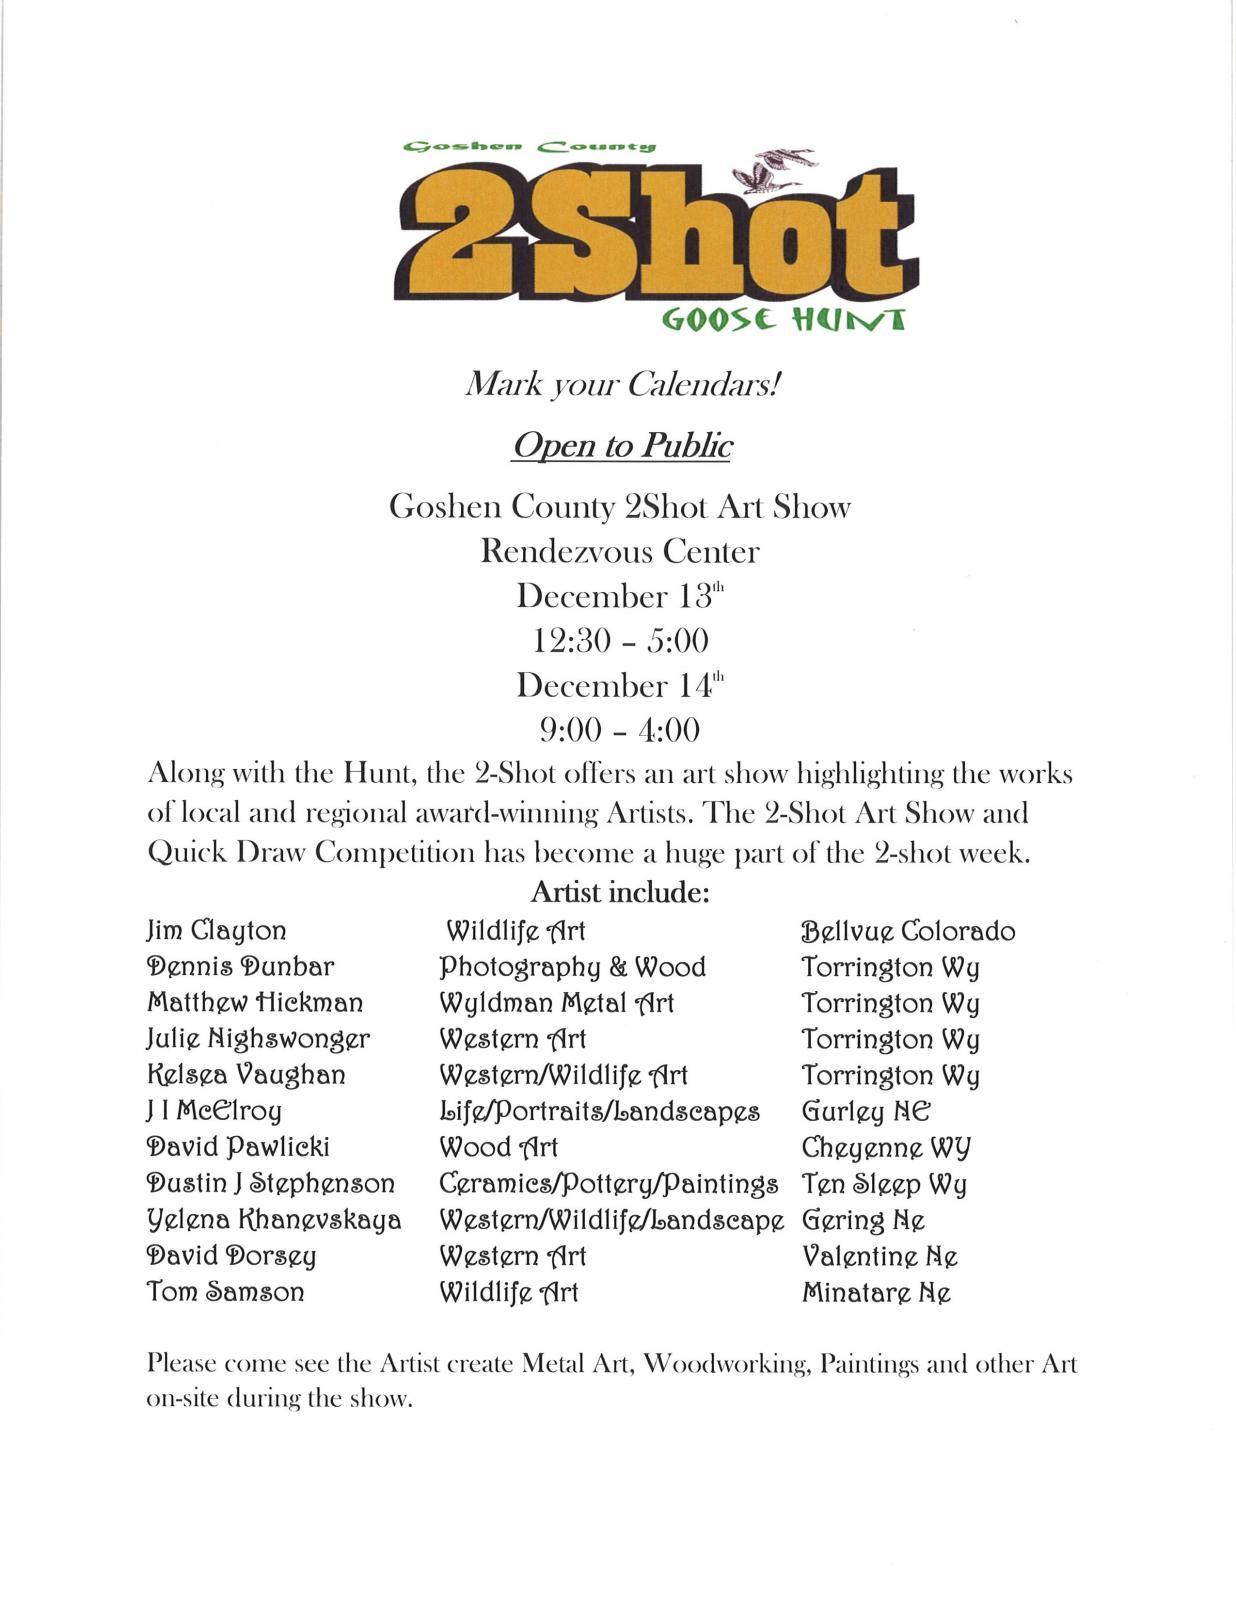 2Shot Art Show Photo